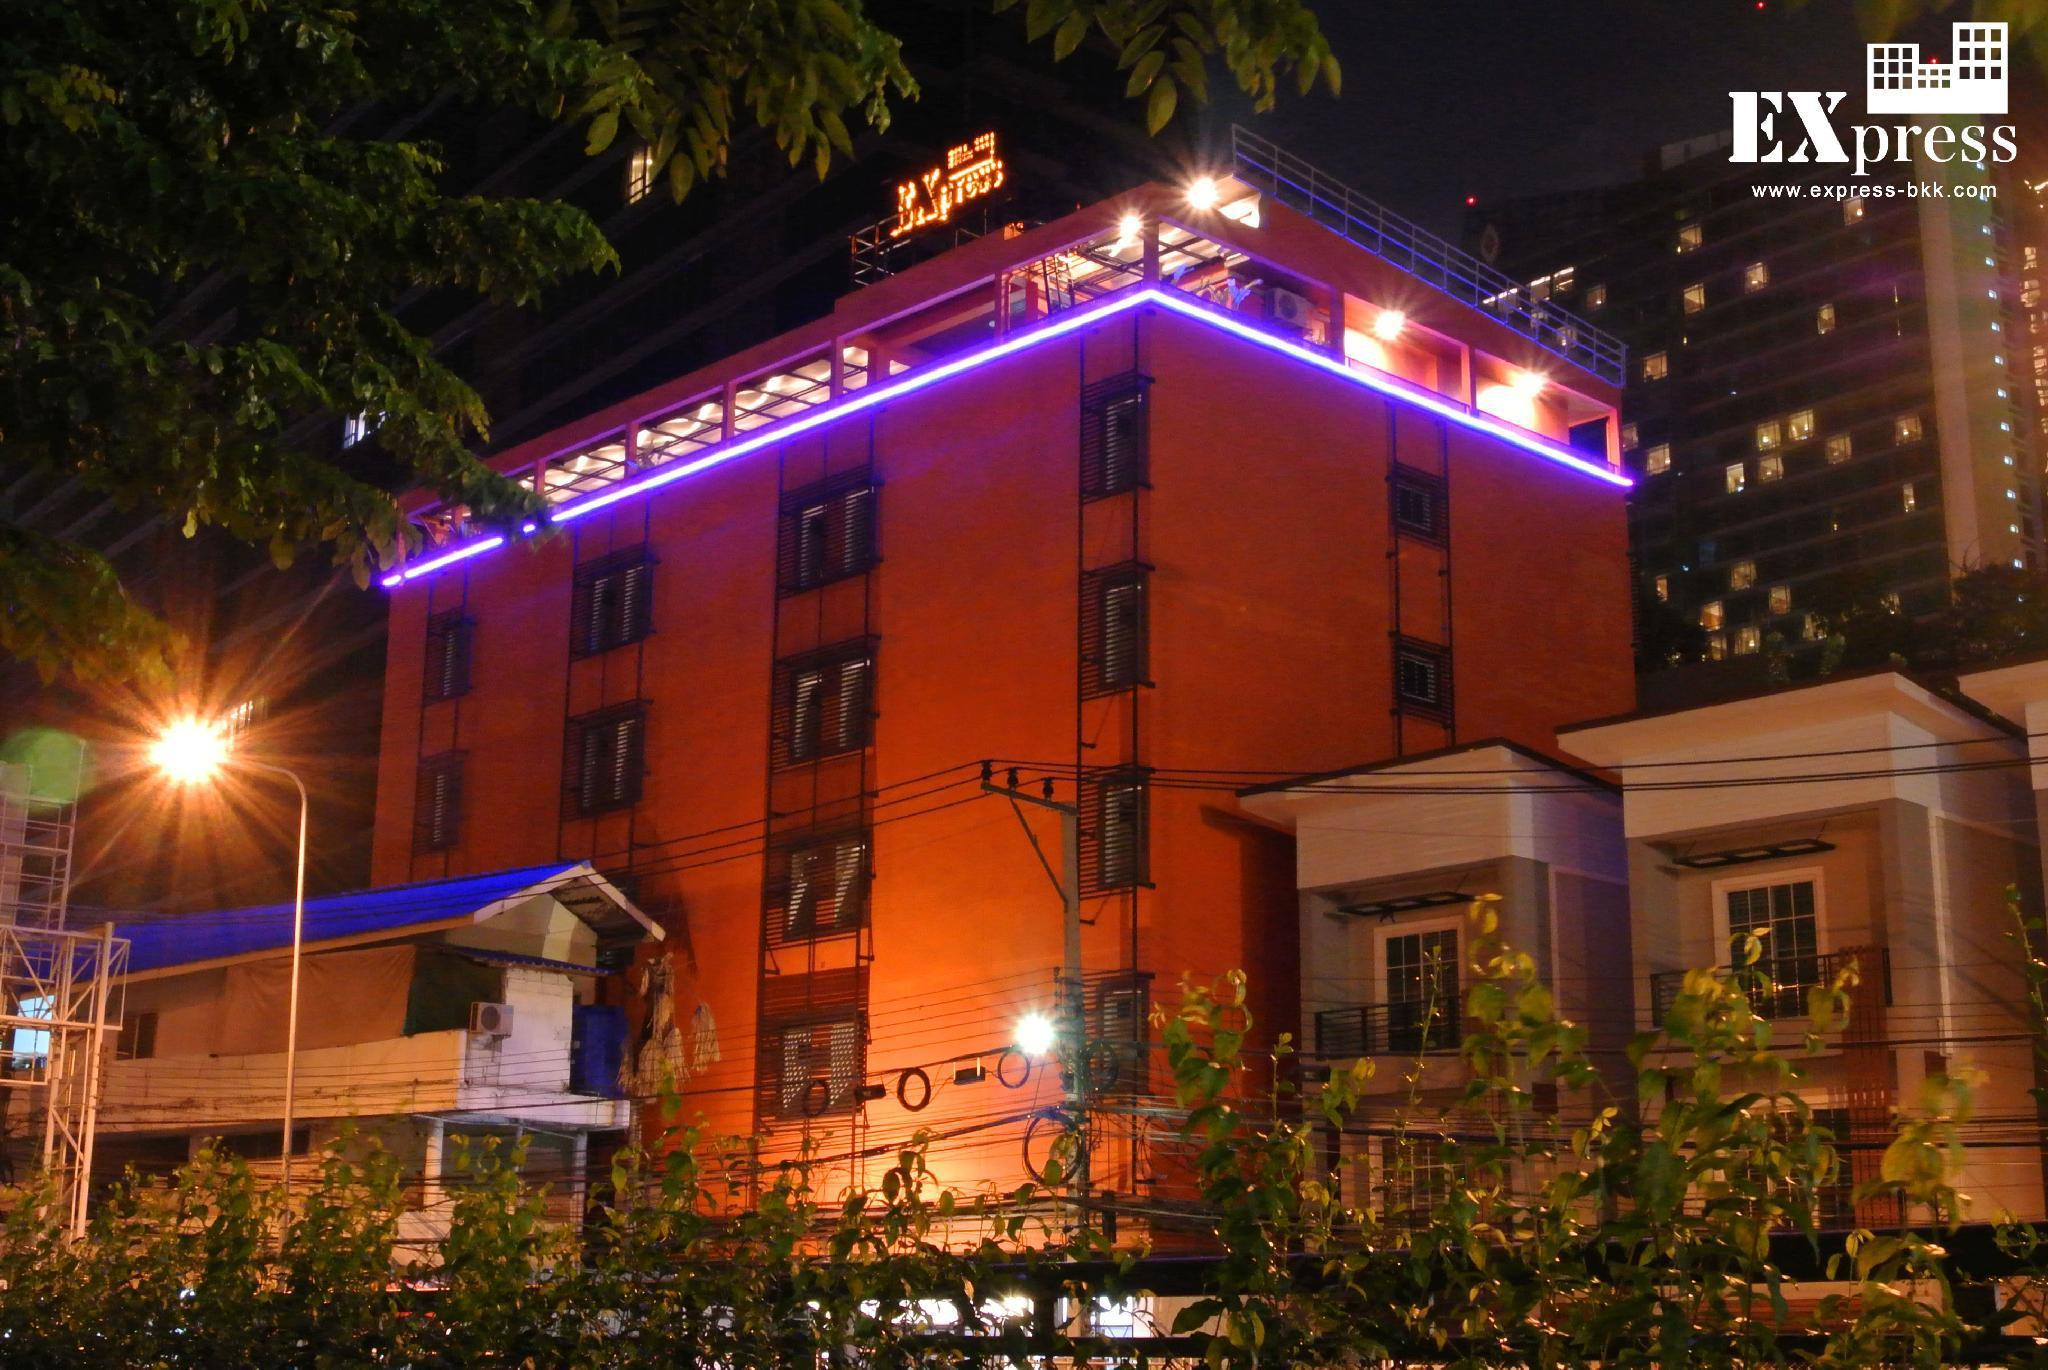 The Express Bangkok Hostel ดิ เอ็กซ์เพรส แบงค็อก โฮสเทล